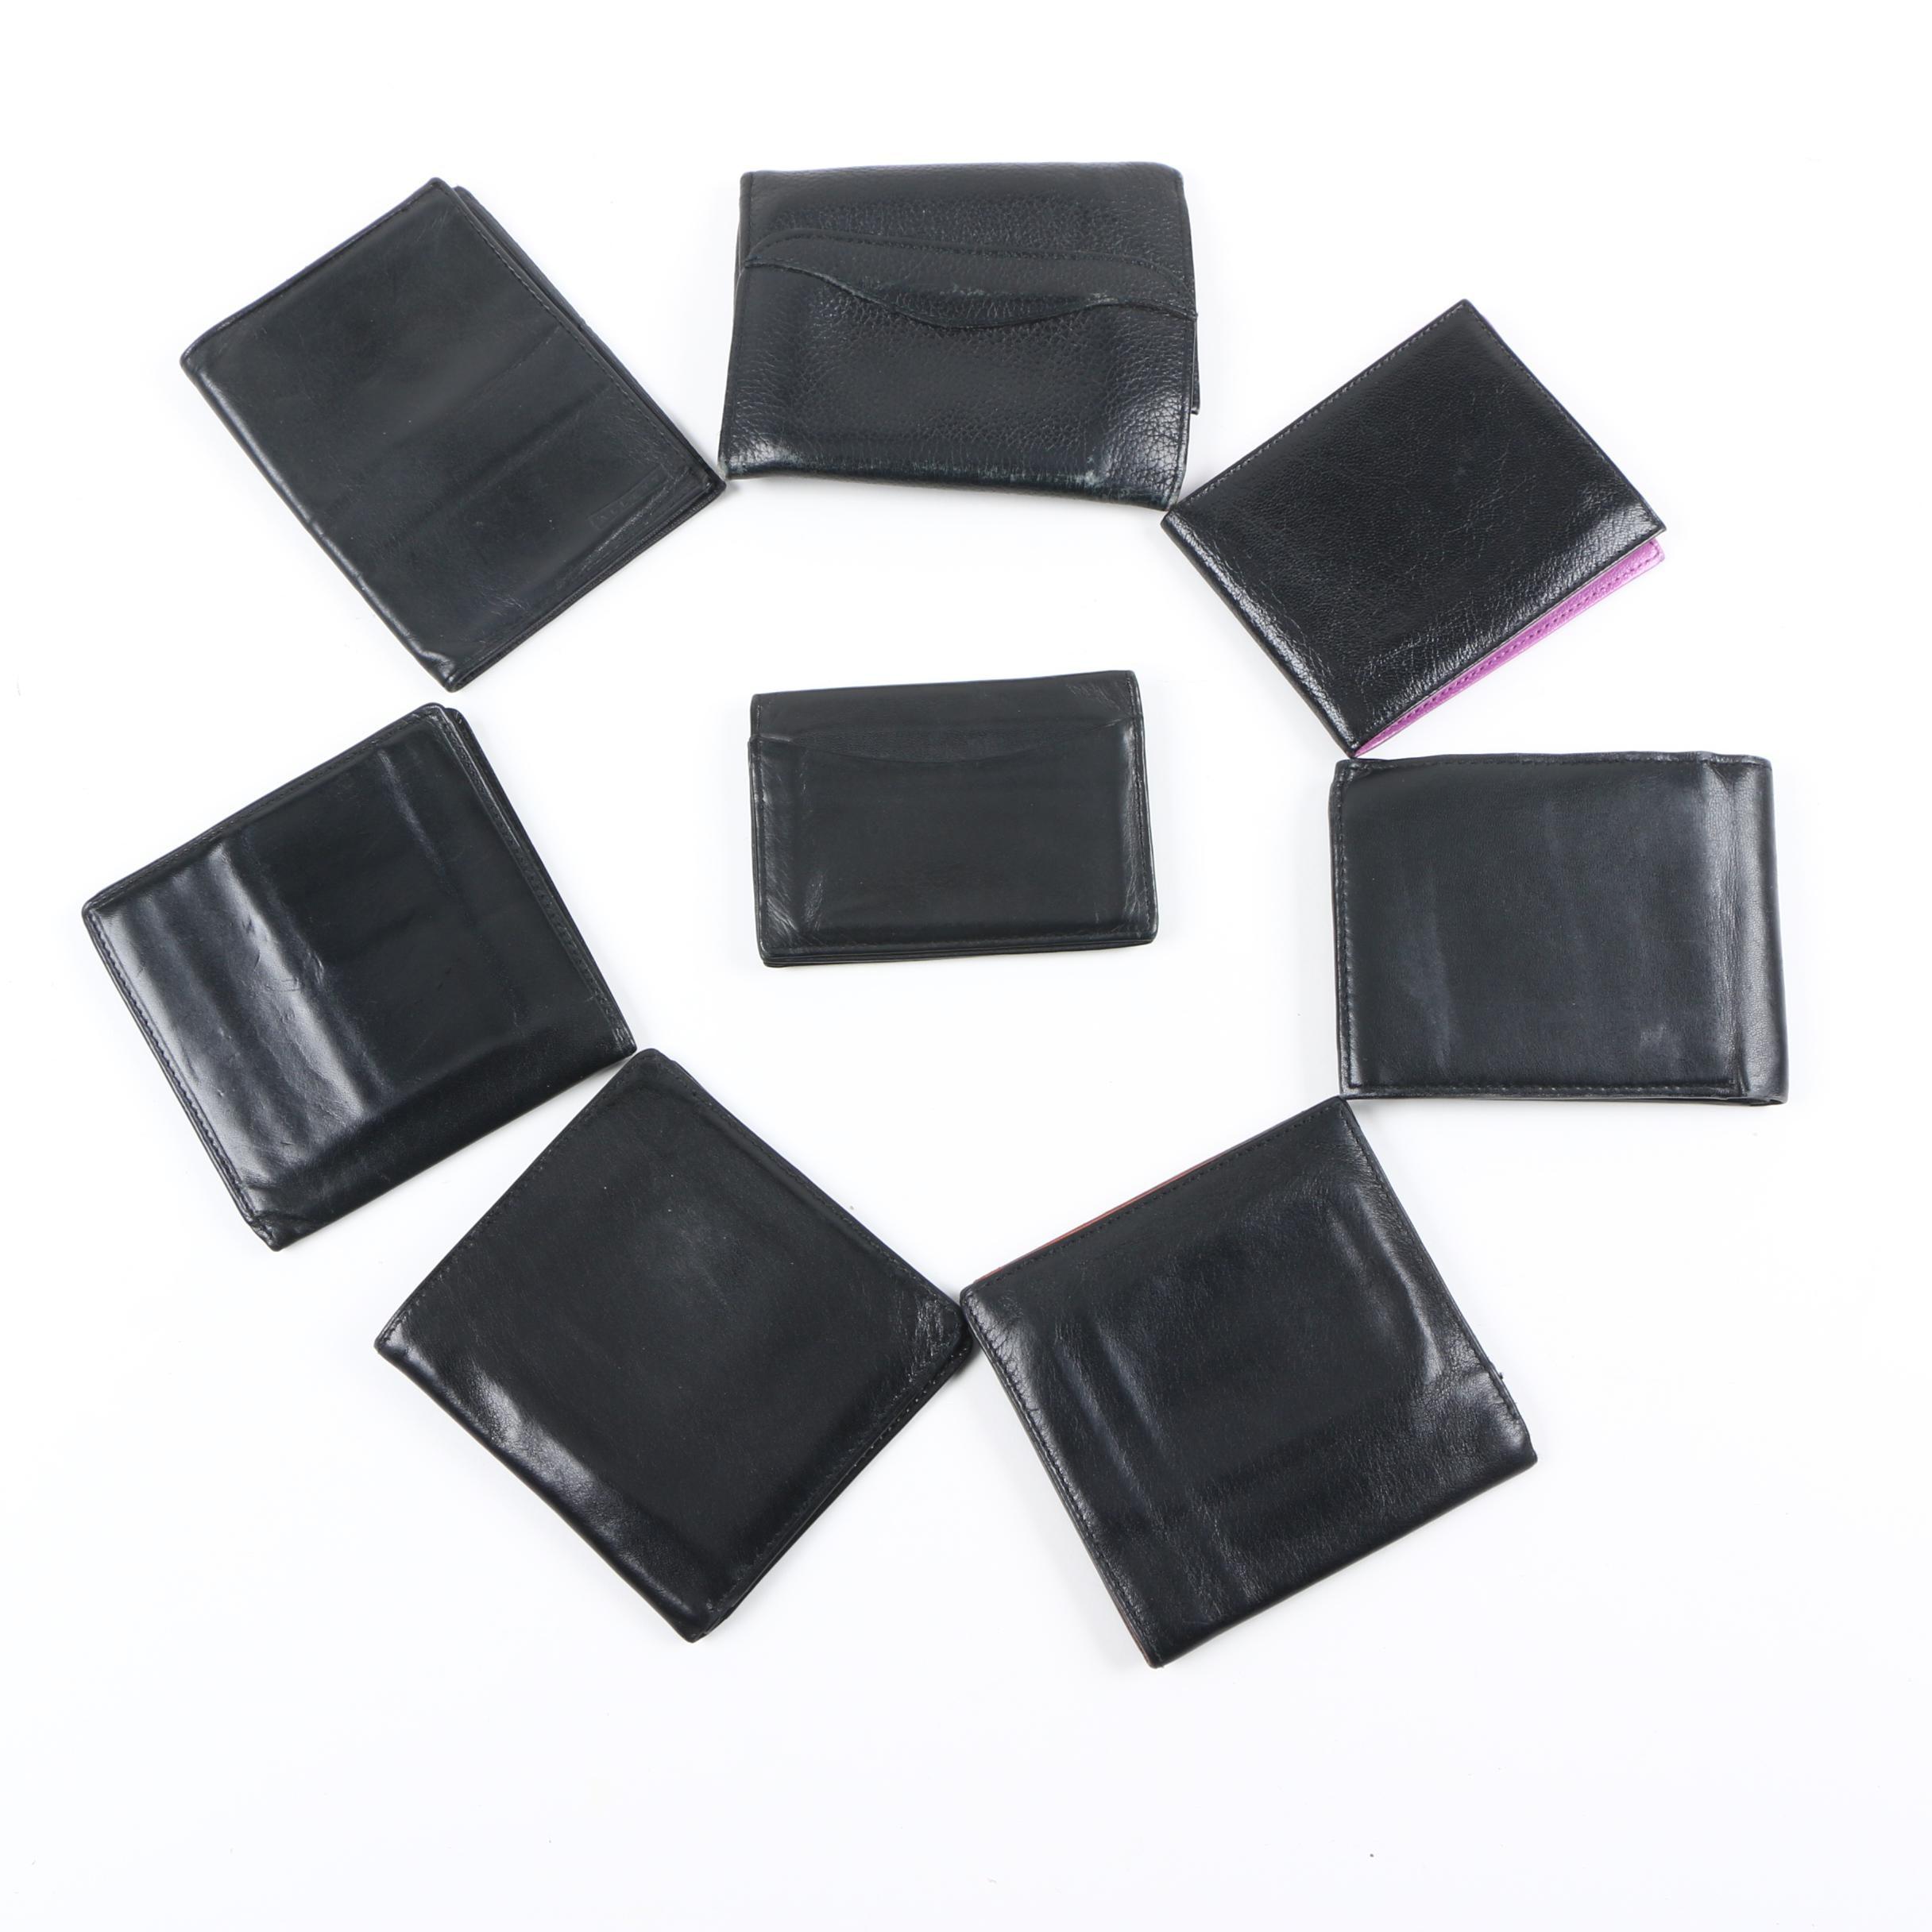 Men's Black Leather Wallets Including Bond Street and Tusk